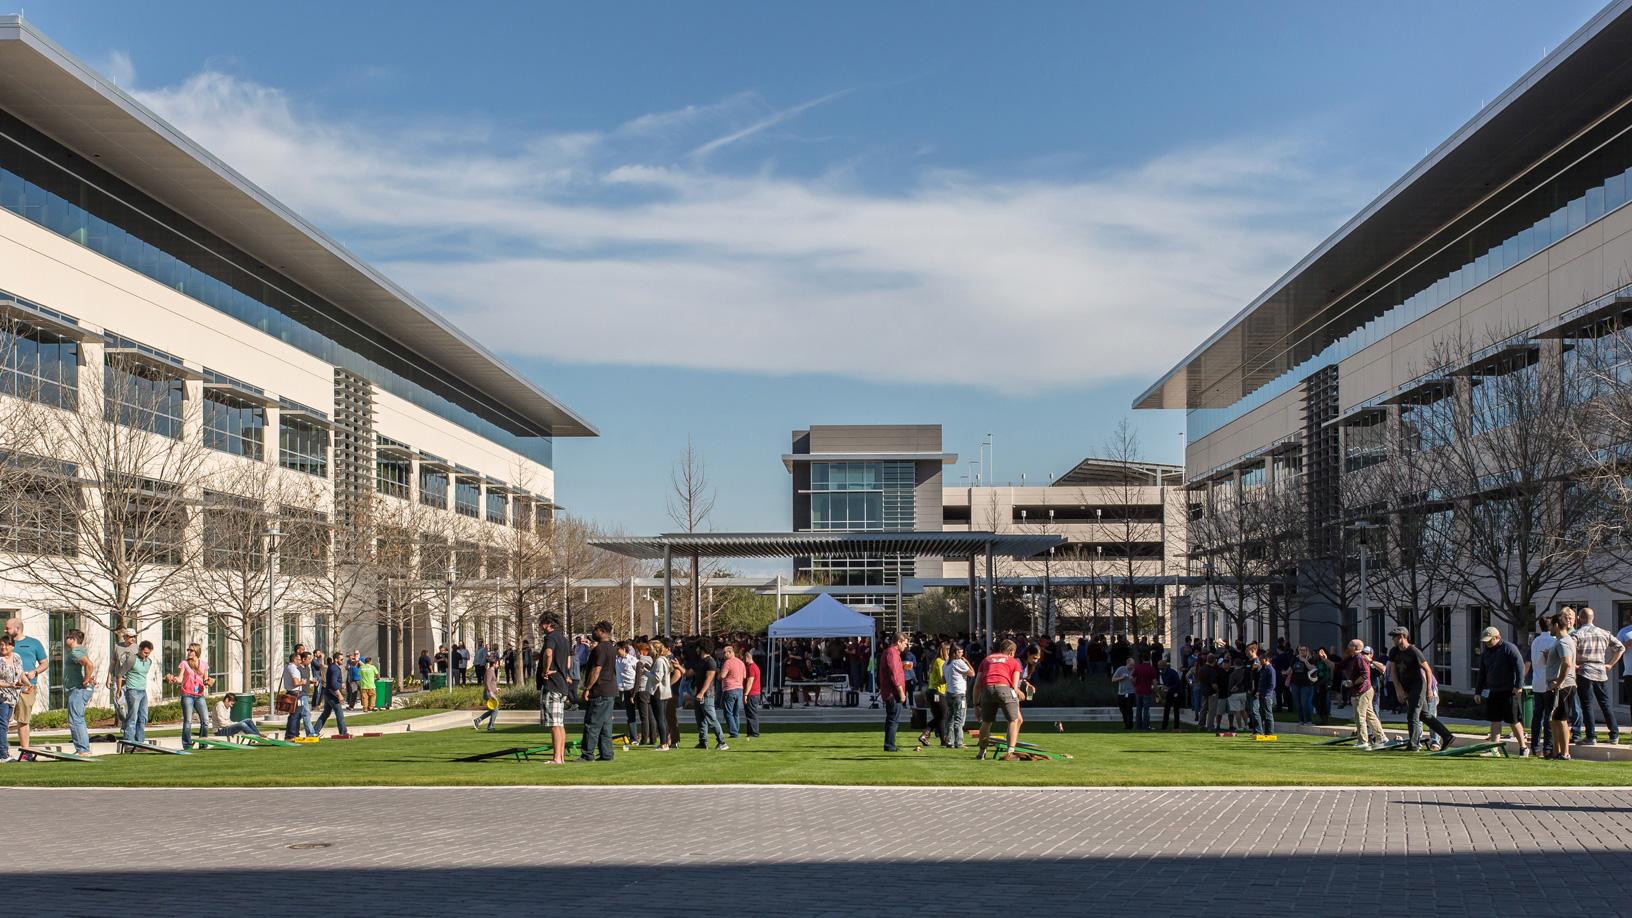 Apple, 오스틴에 새로운 캠퍼스 건설, 미국에서 고용 확대